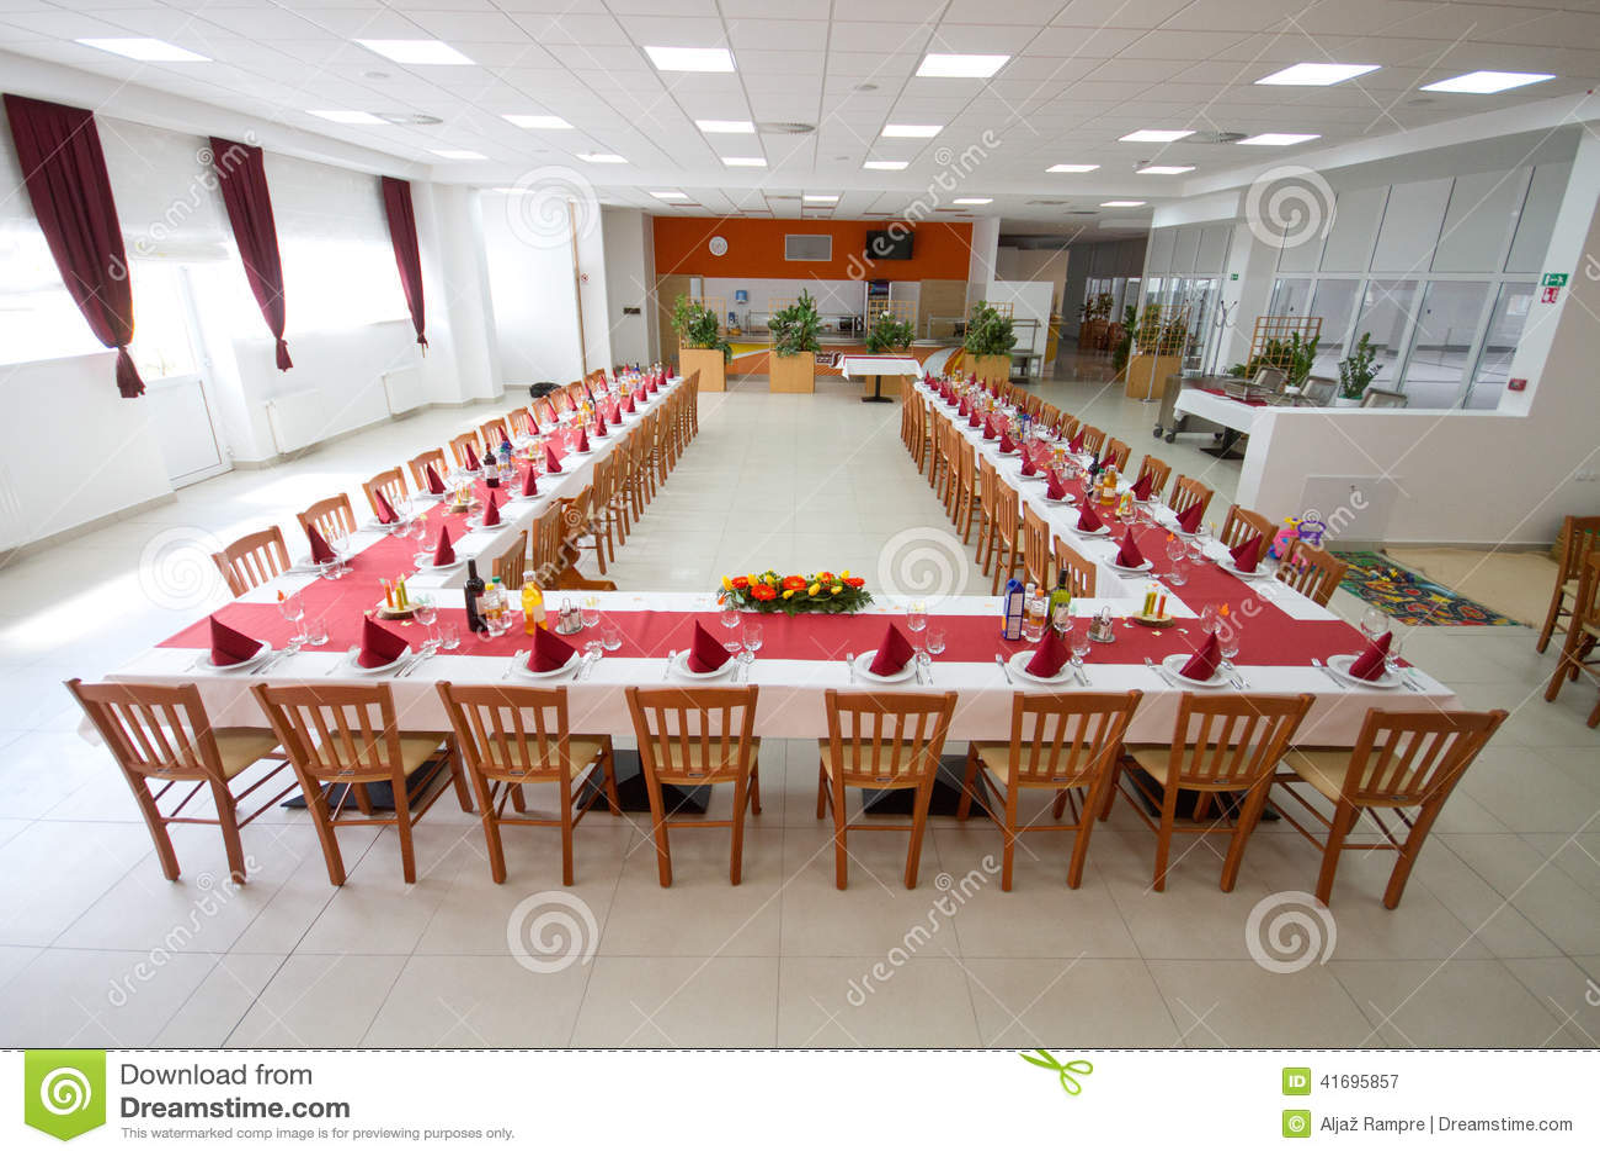 table setting stock photo - image: 41695857